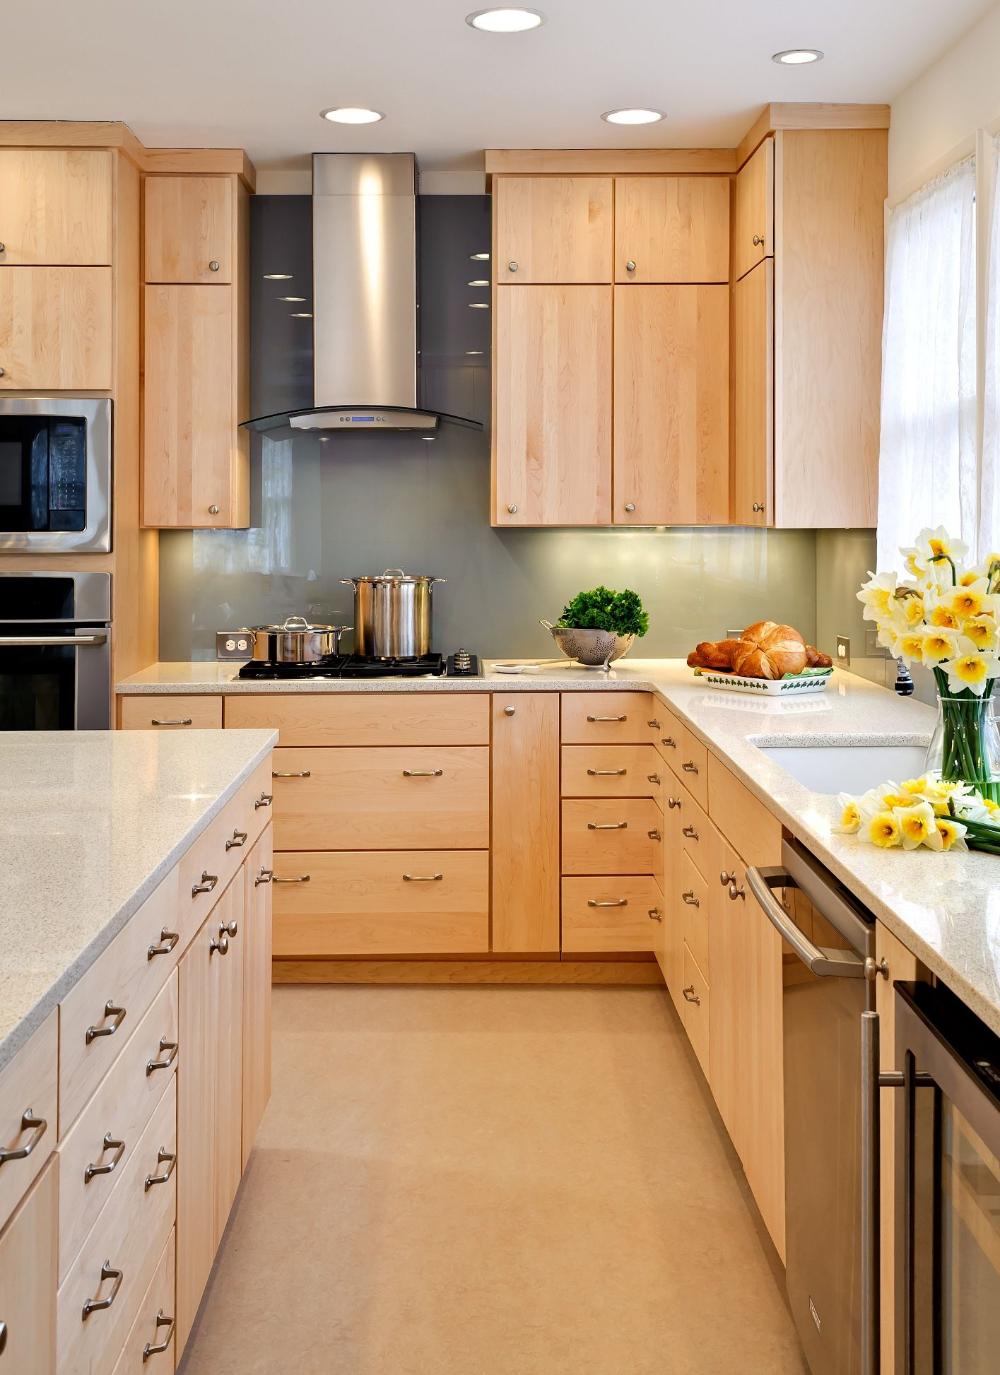 Light Maple Cabinets Noburn Info Kitchen - Benimmulku in 10